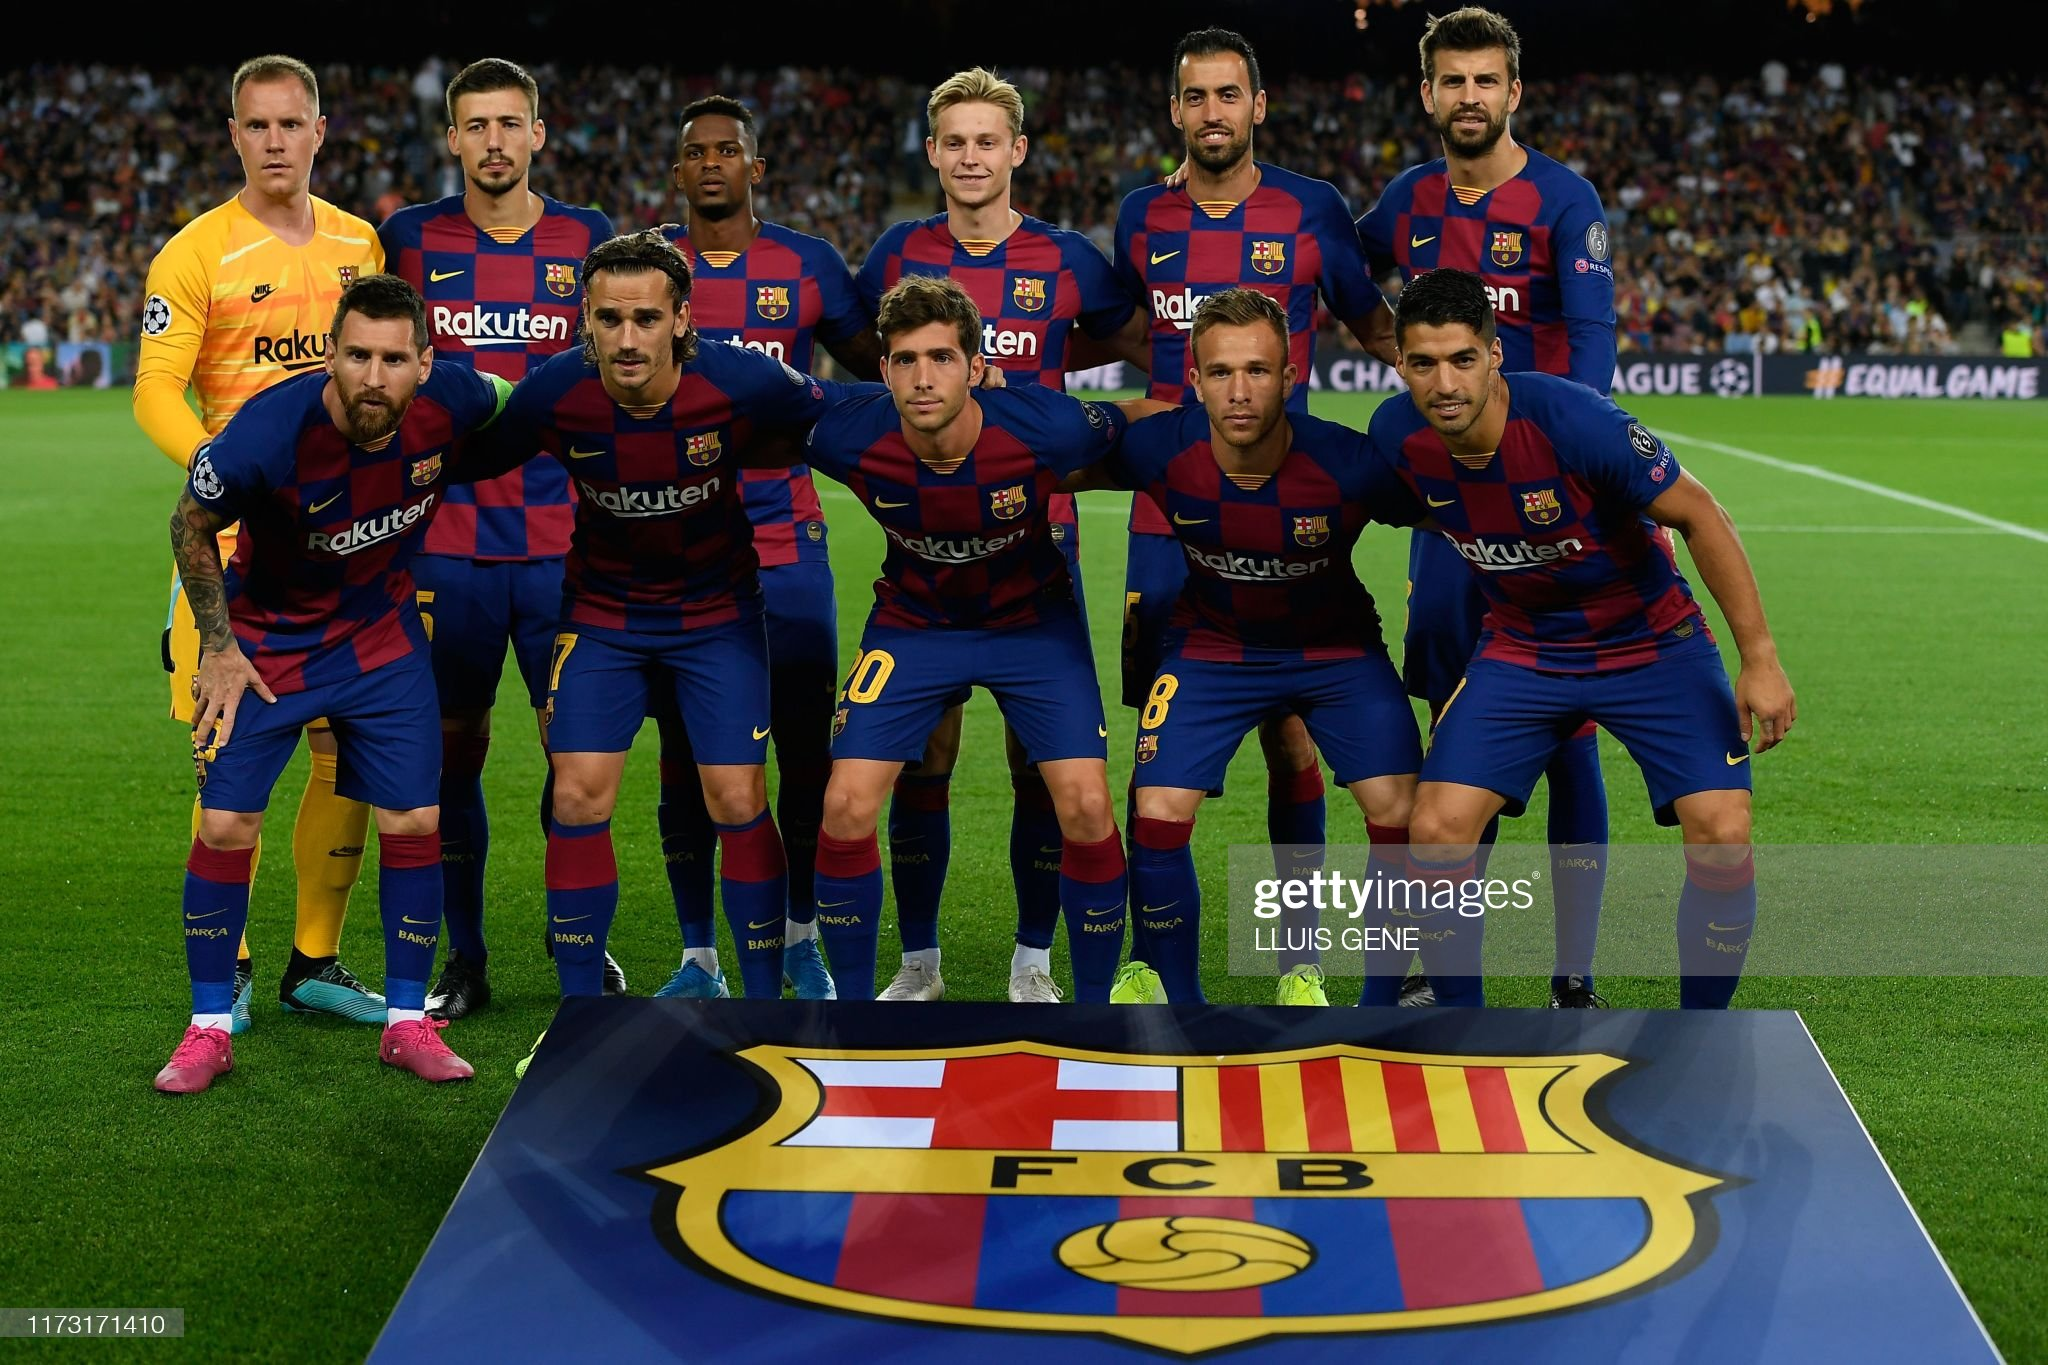 صور مباراة : برشلونة - إنتر 2-1 ( 02-10-2019 )  Barcelonas-argentine-forward-lionel-messi-barcelonas-french-forward-picture-id1173171410?s=2048x2048